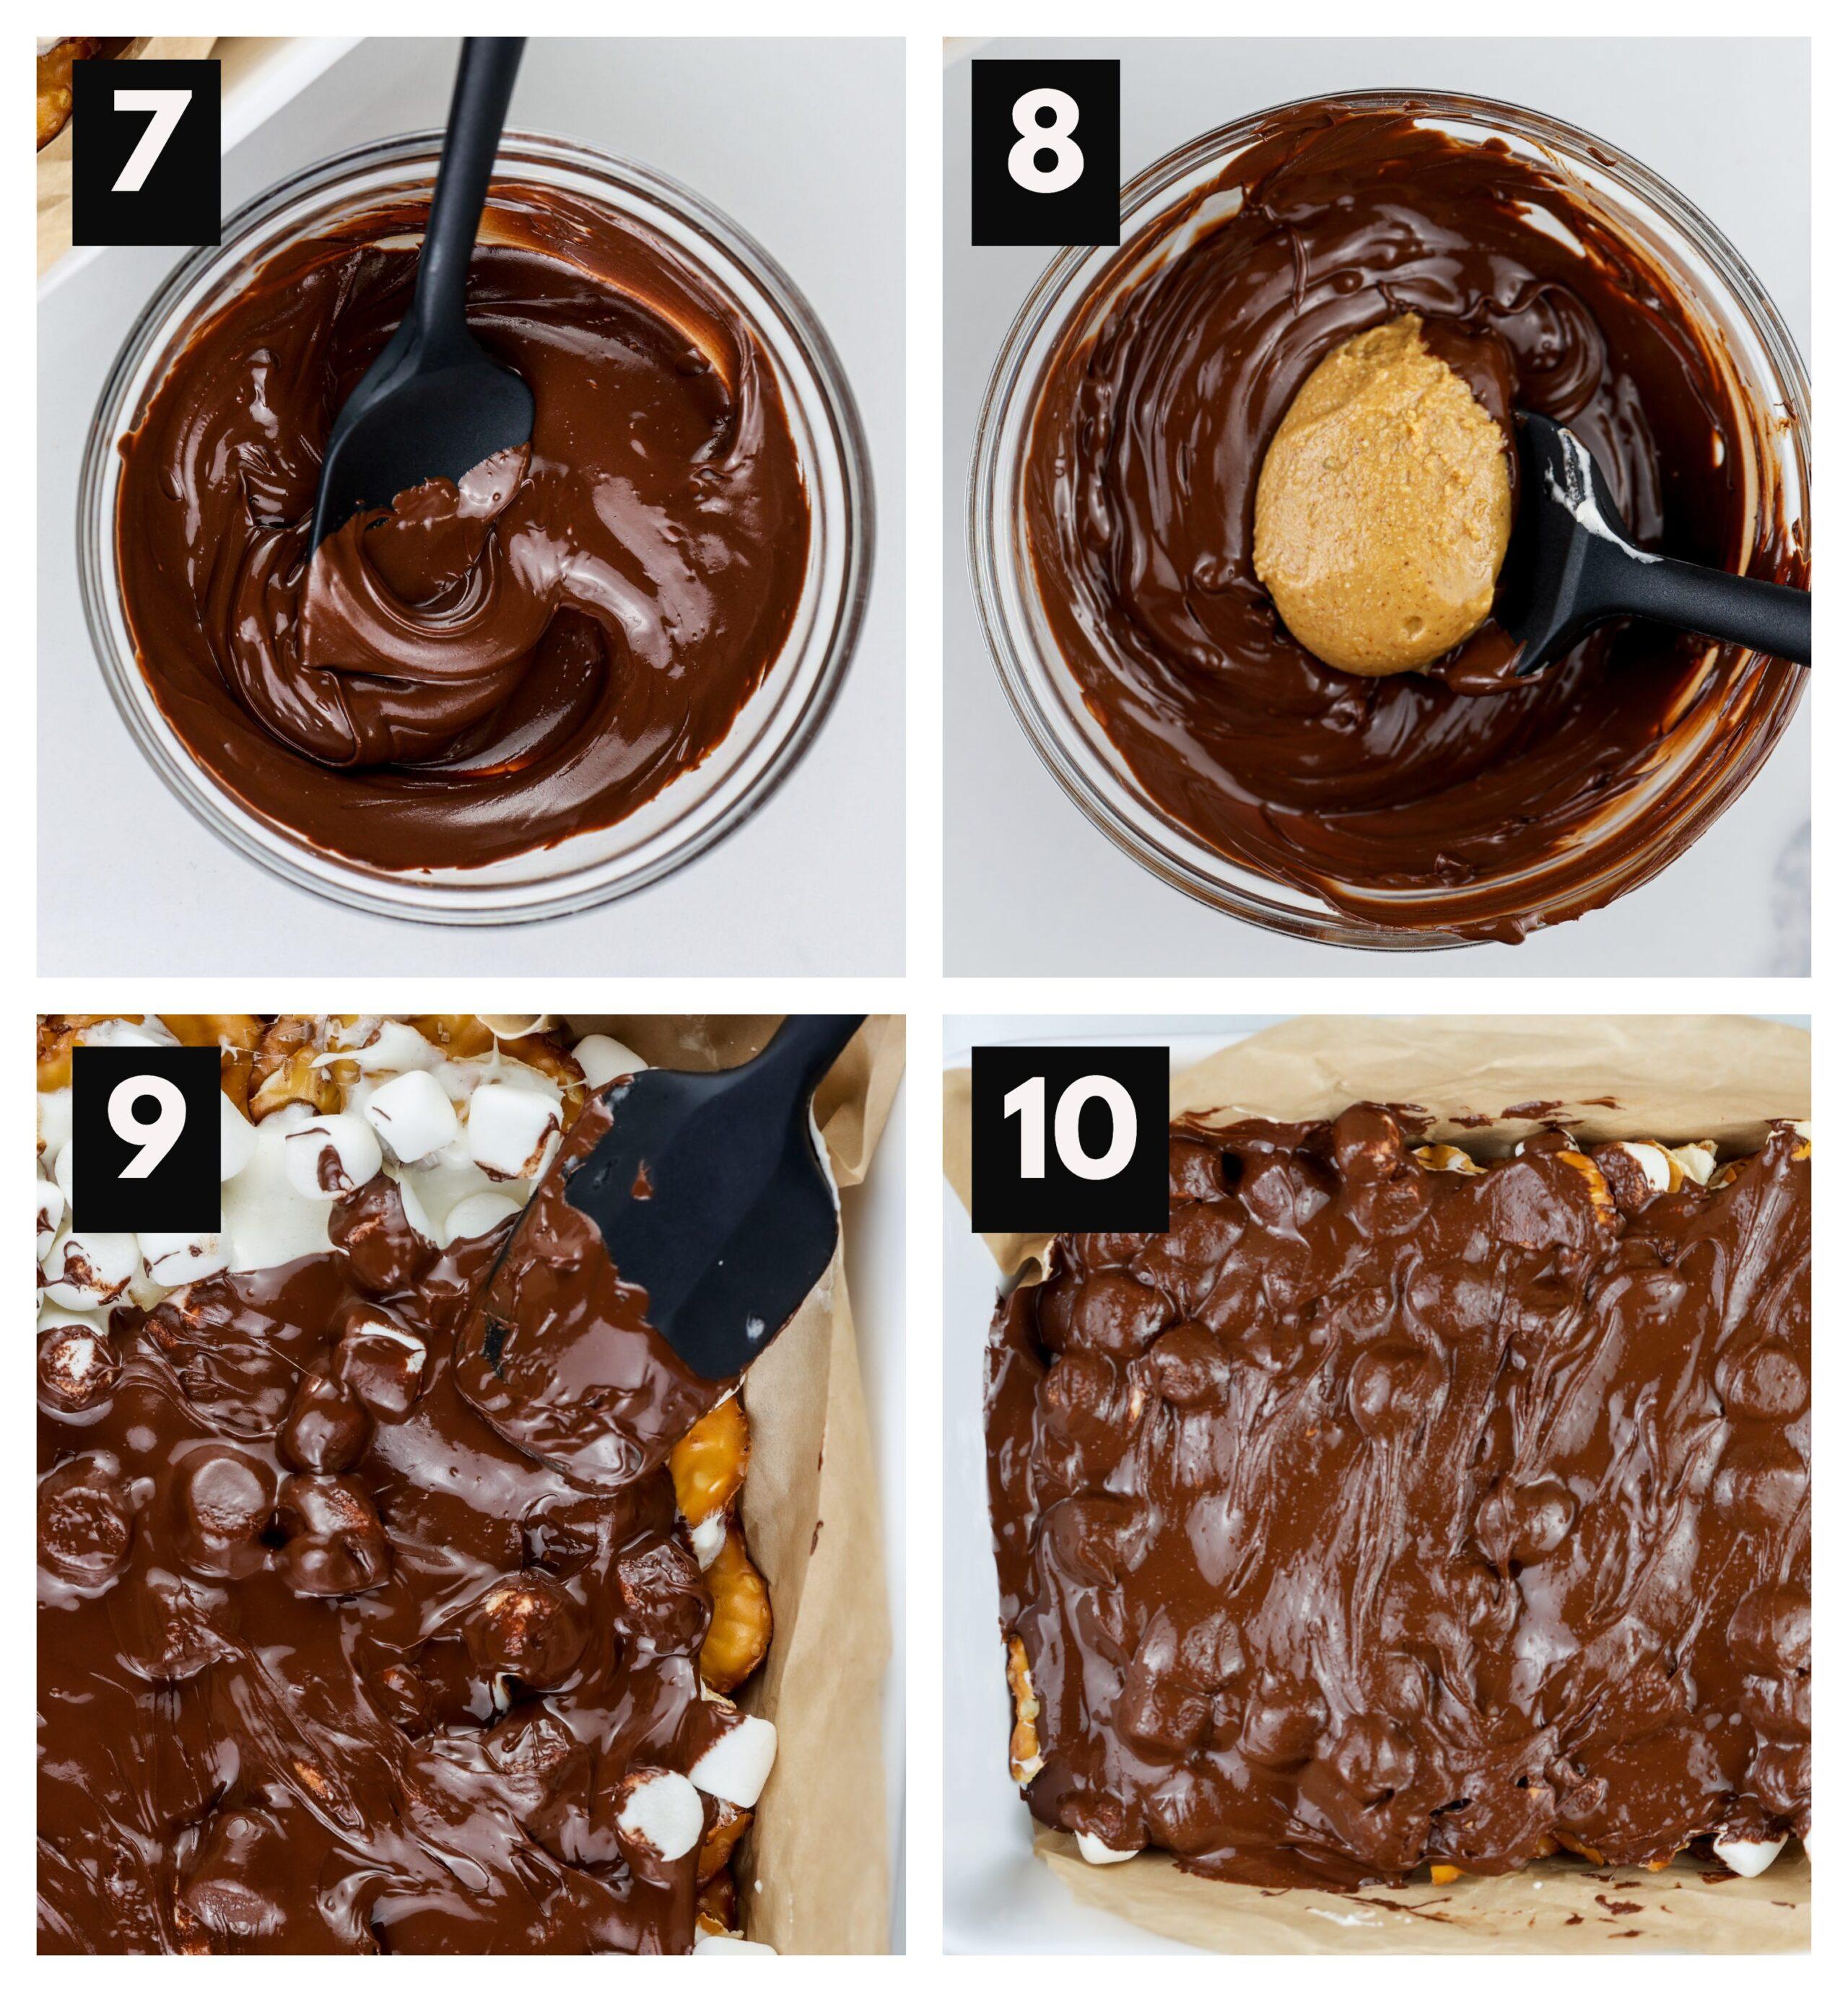 Process shots to melt chocolate and add to pretzel bark.